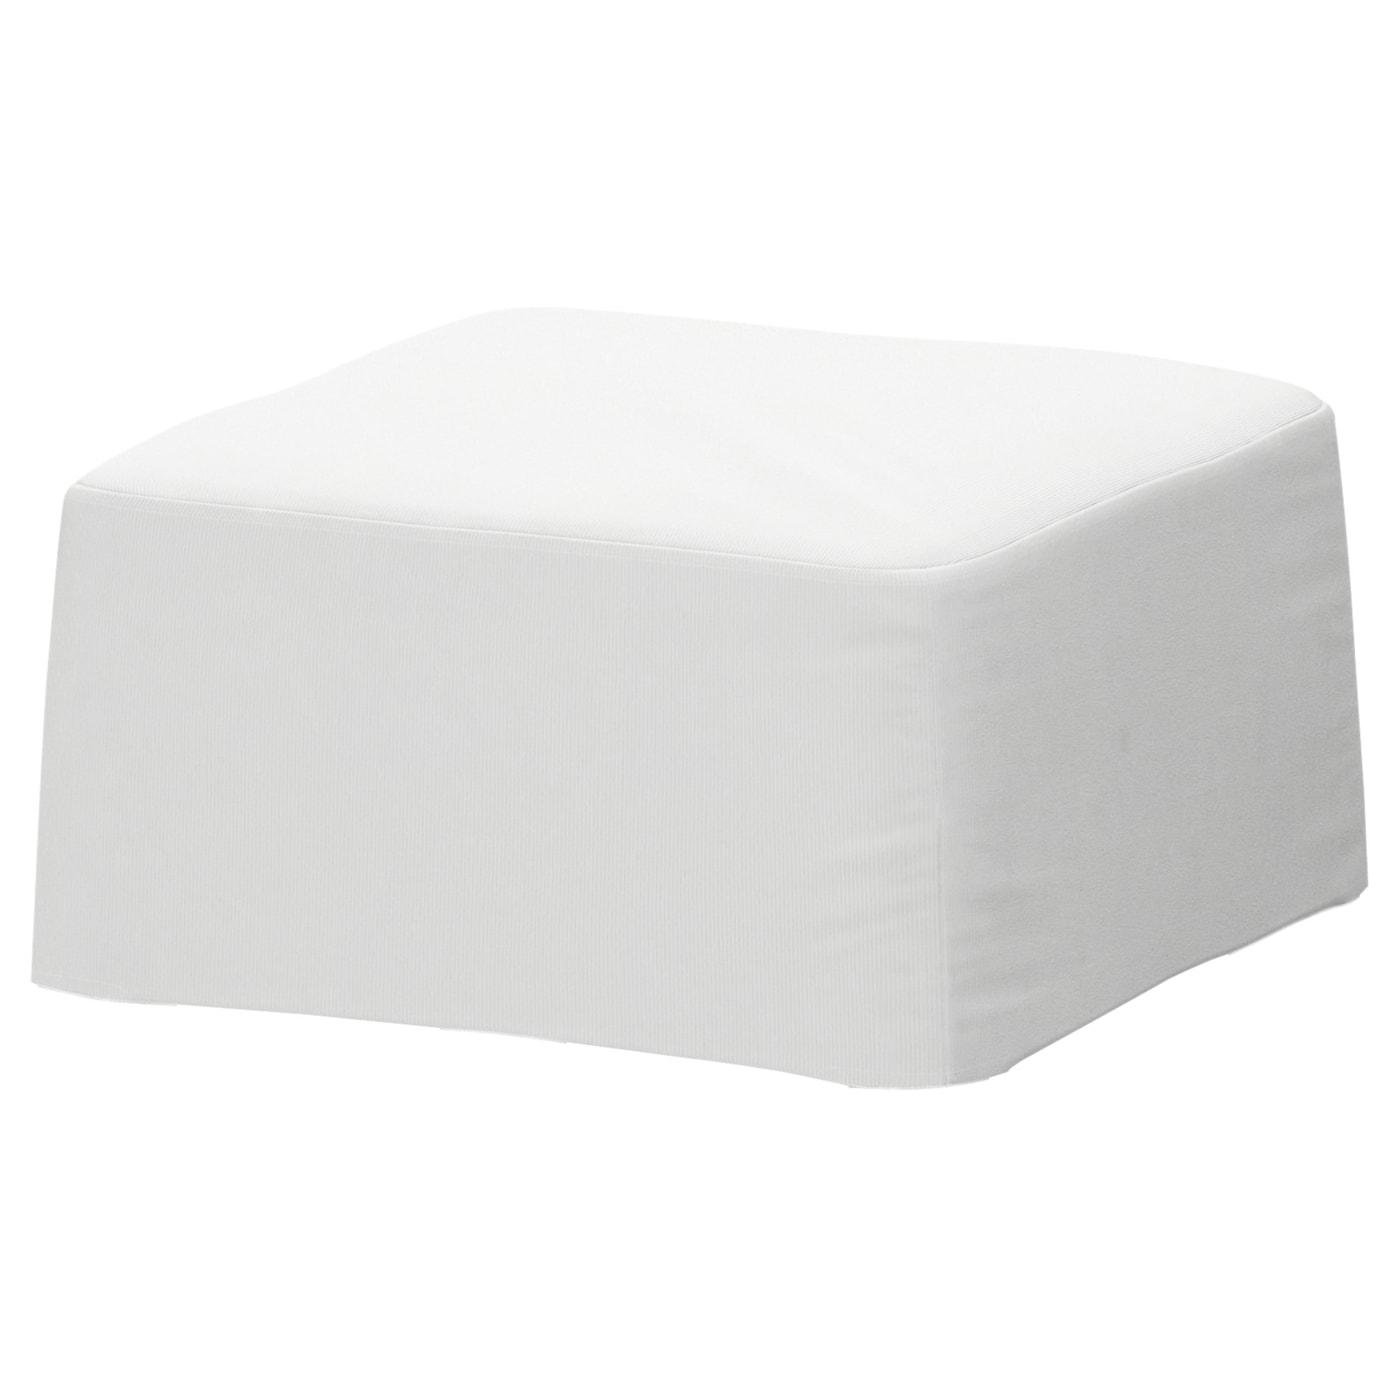 NILS Stool cover Blekinge white   IKEA